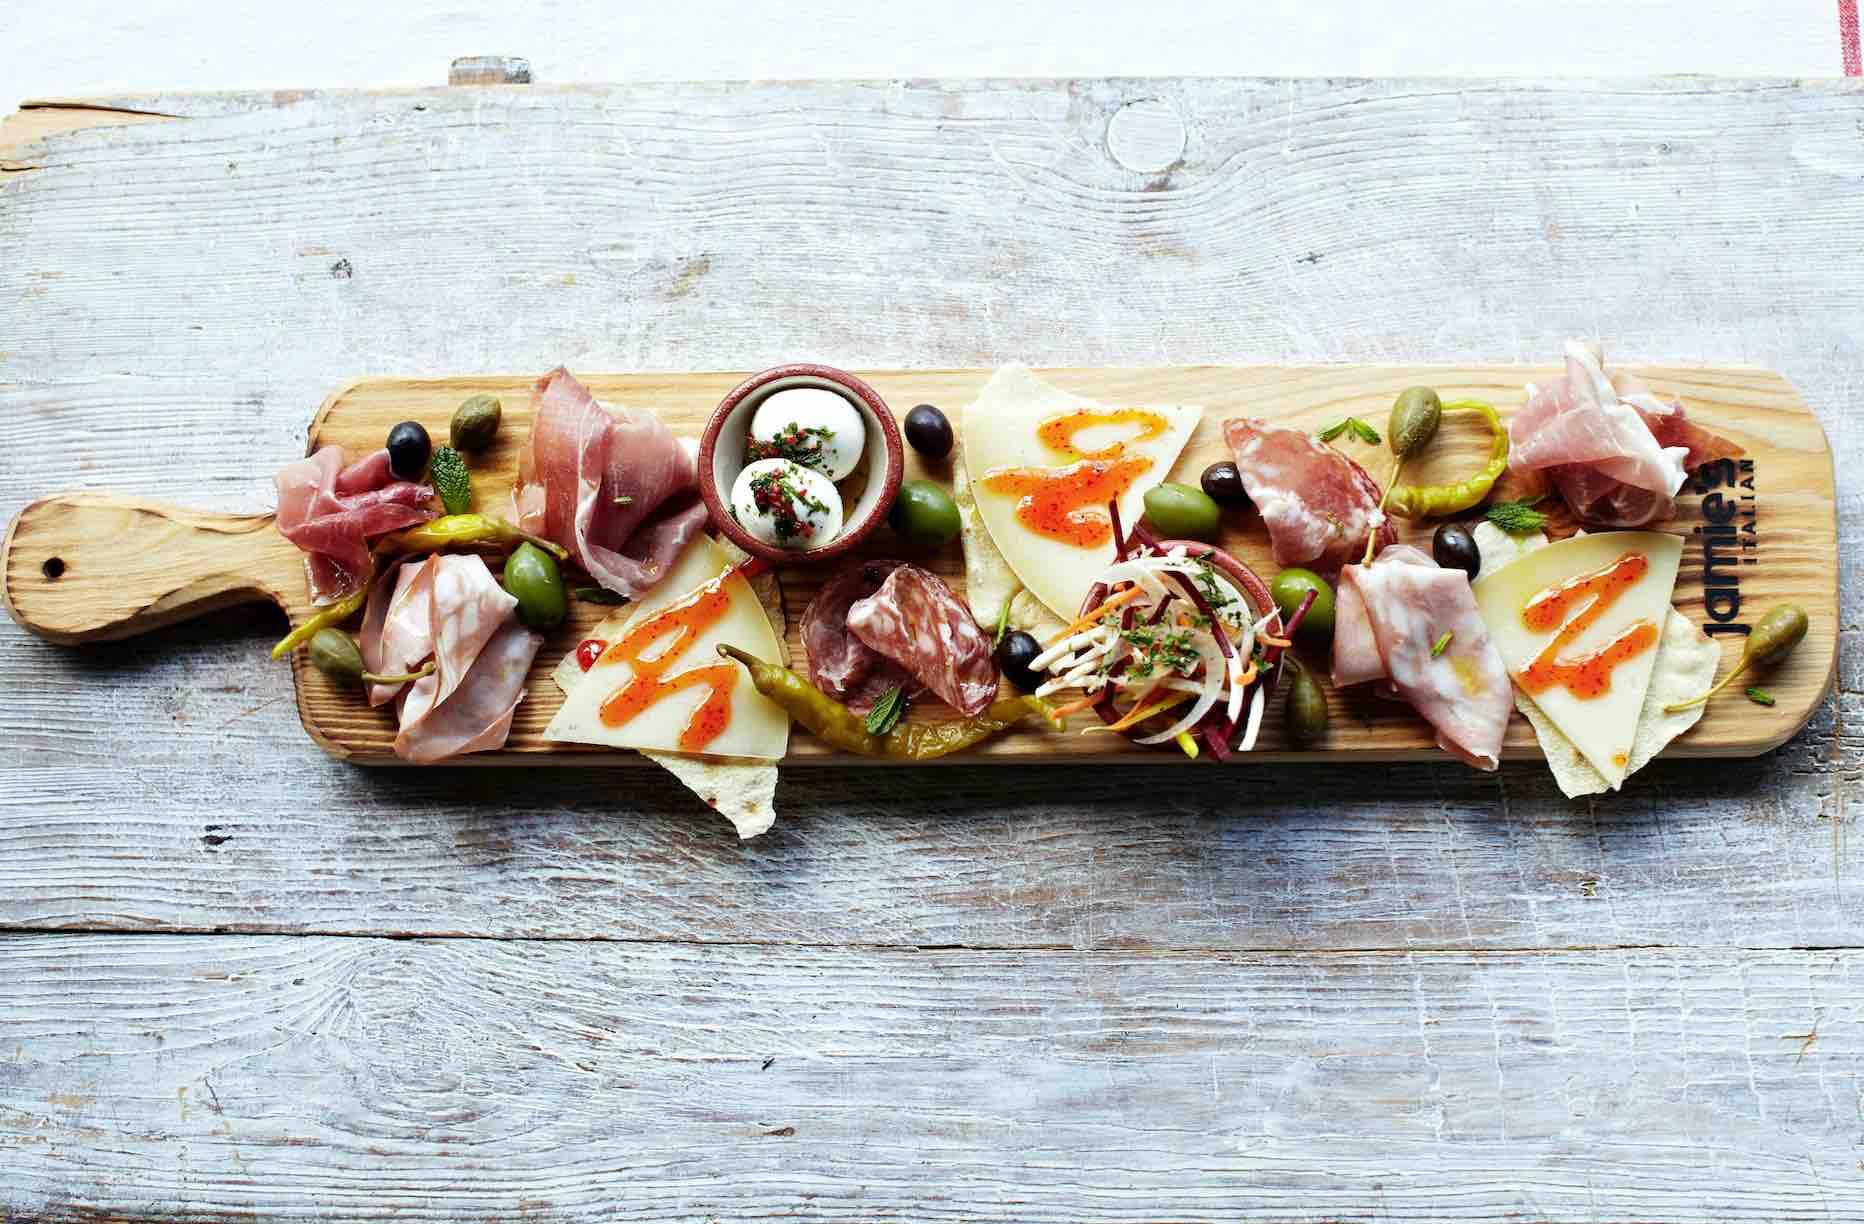 Royal Caribbean Chef Jamie Oliver Antipasti Planks - AspirantSG